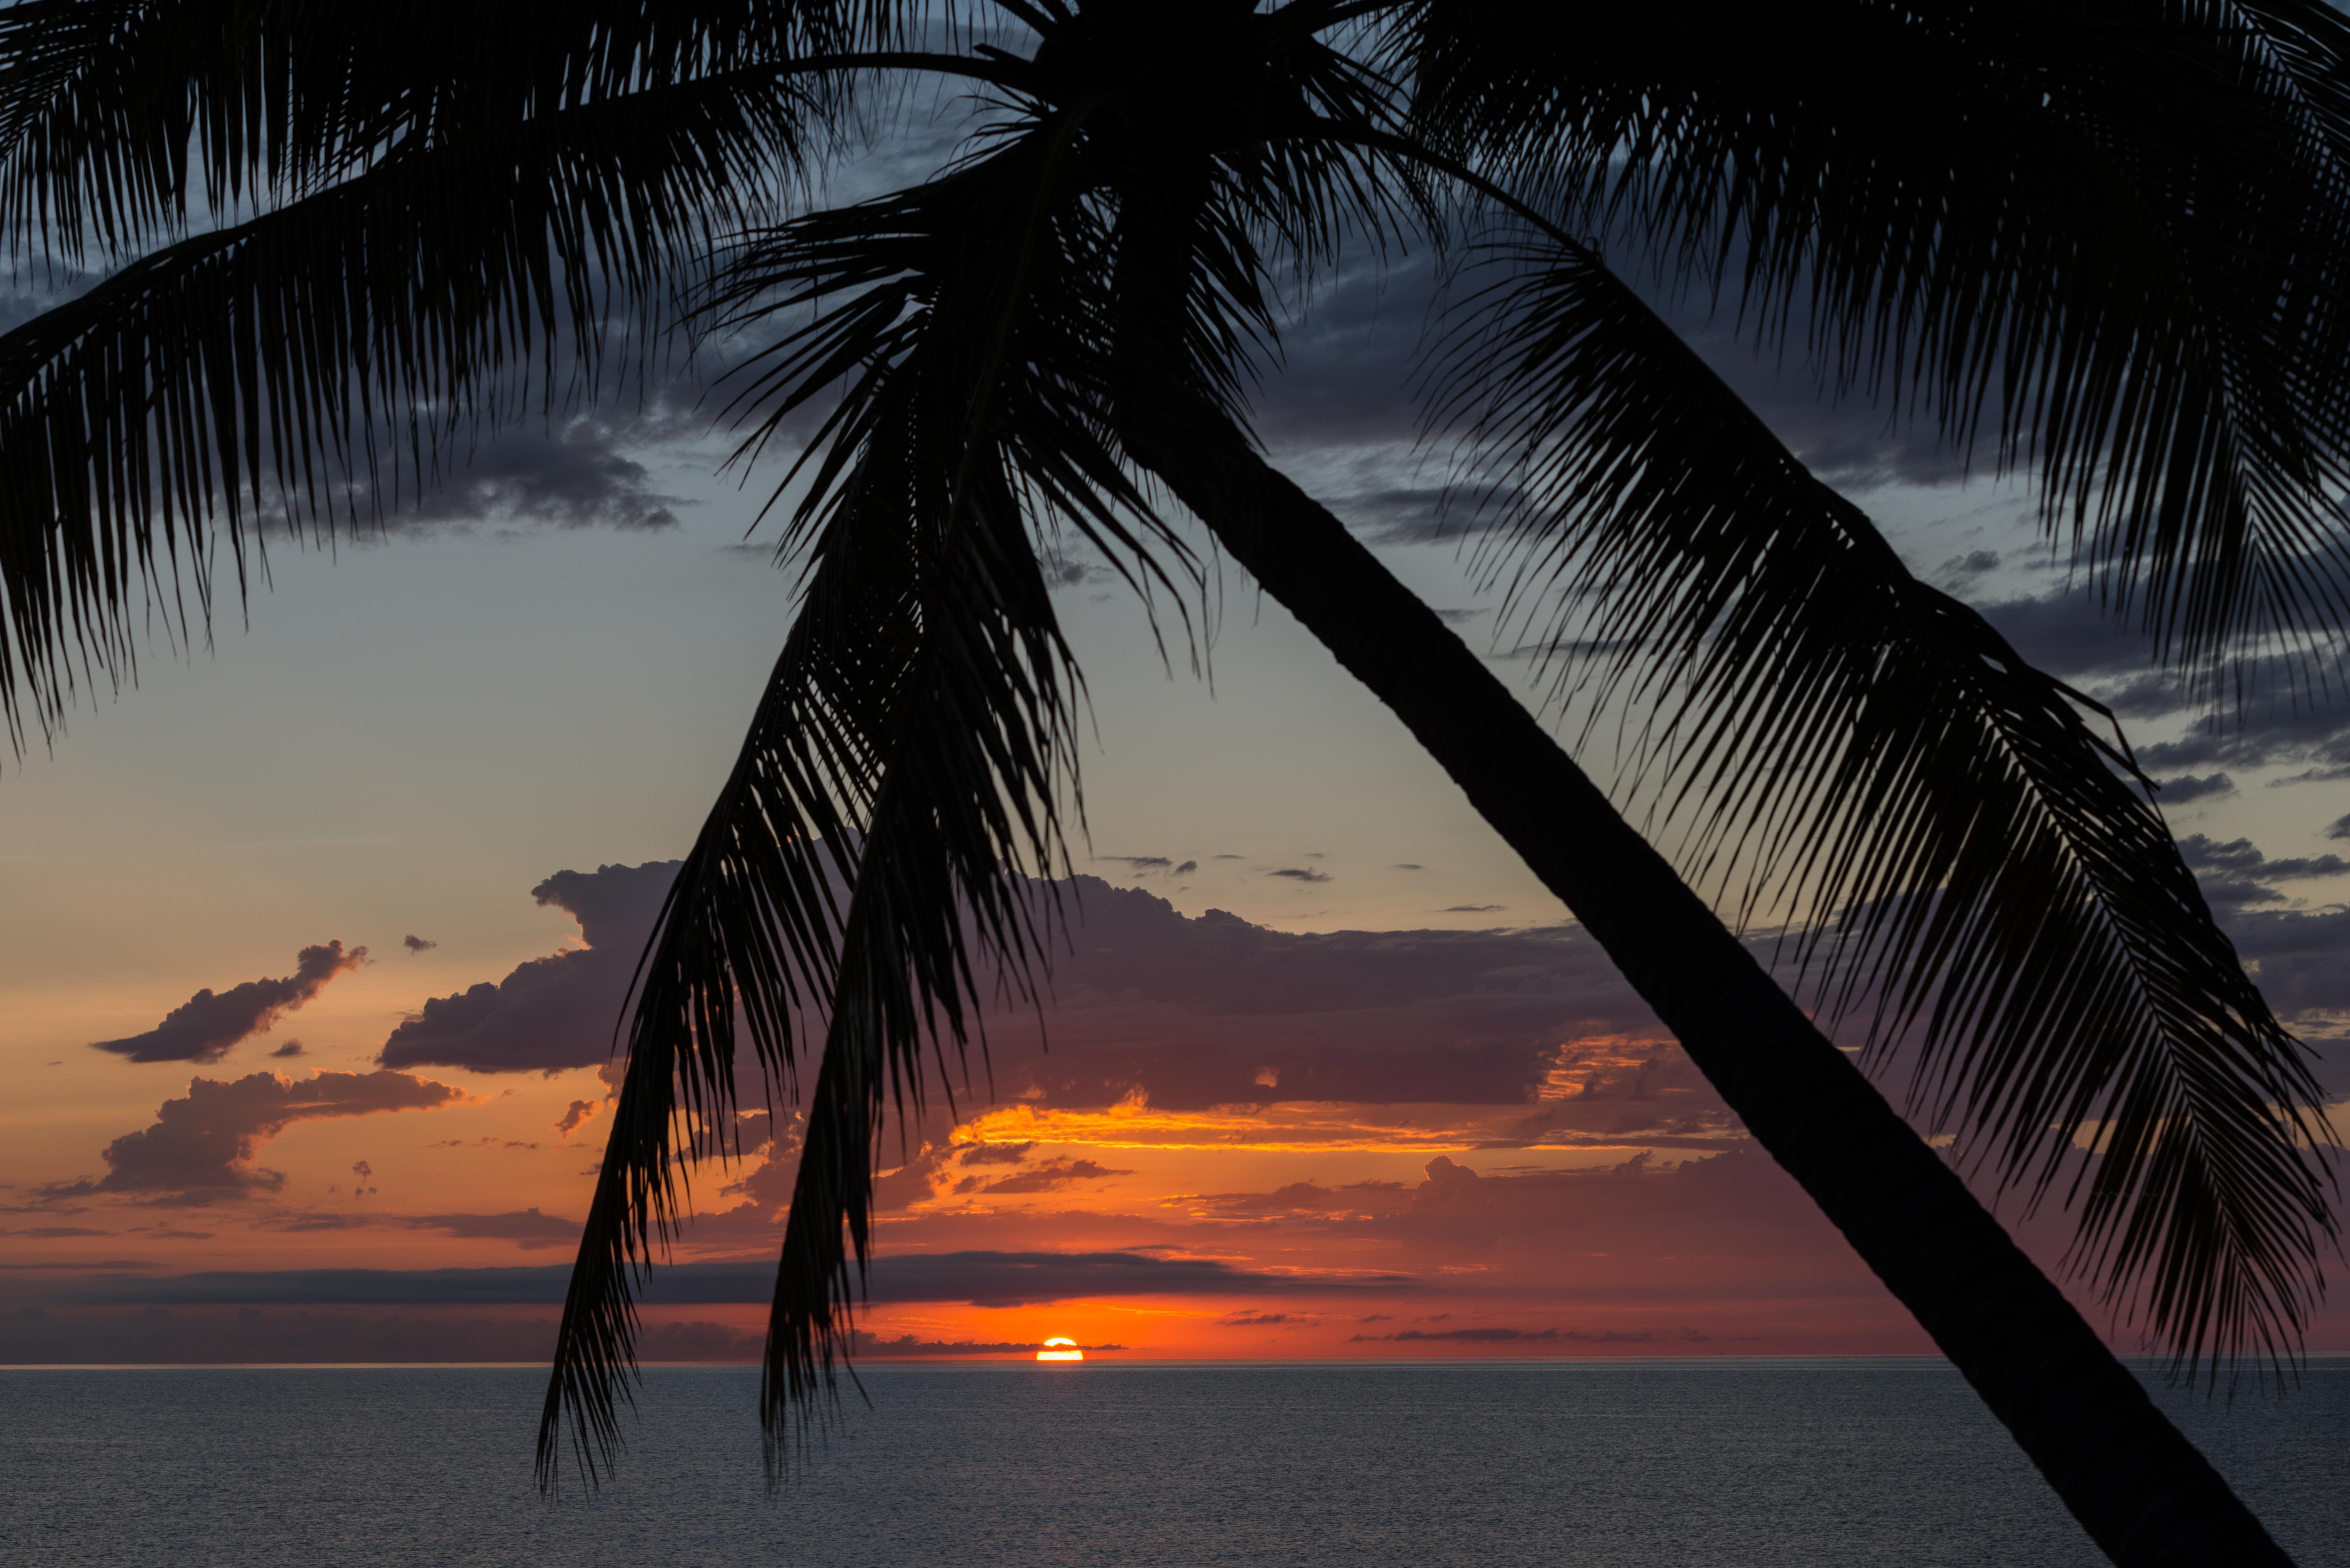 http://www.thalabeach.com.au/wp-content/uploads/2010/07/Thala_Beach_Nature_Reserve_2016__51.jpg